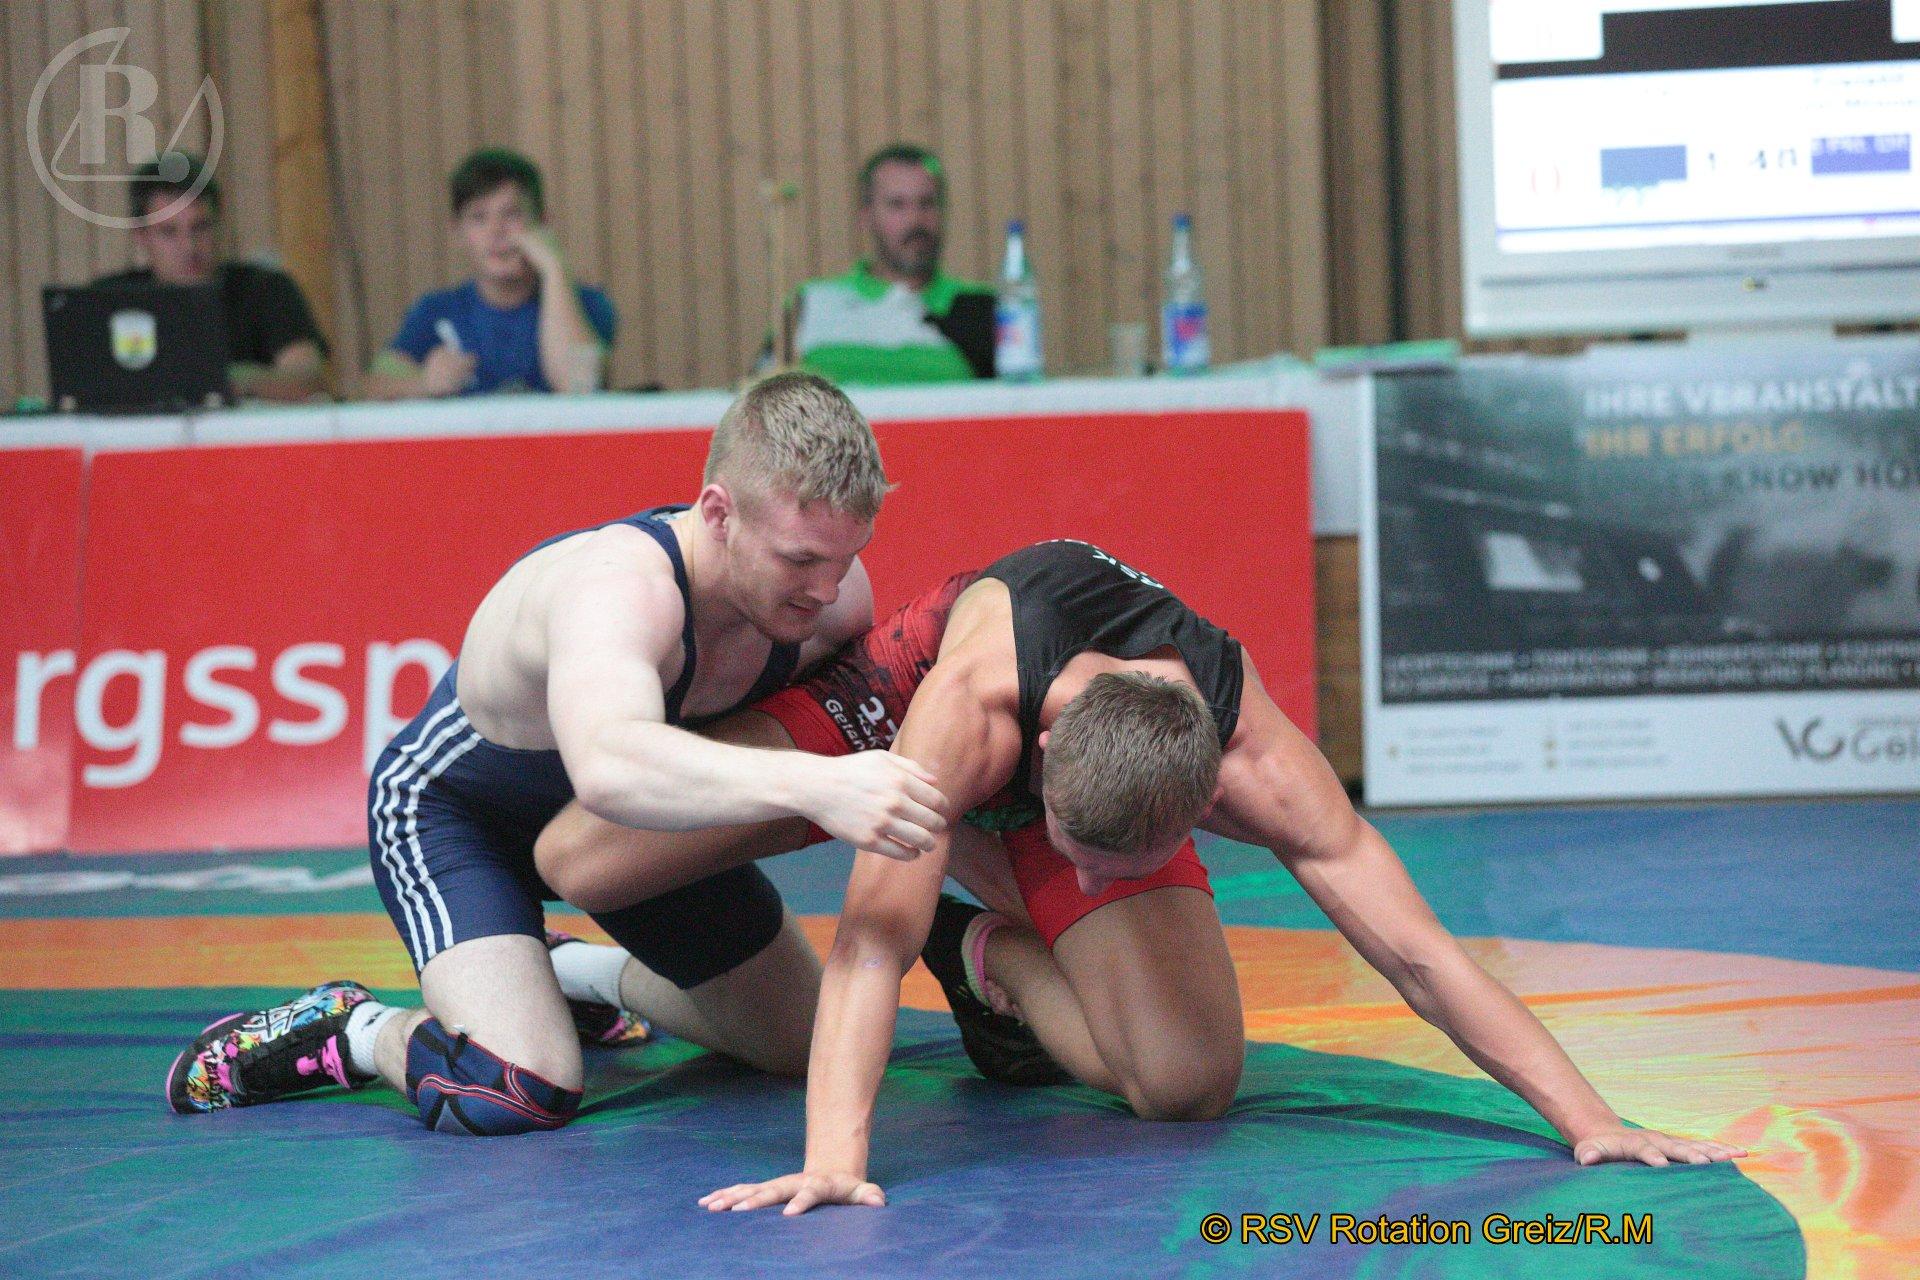 72 kg Freistil: Franke, Felix, WKG Gelenau II/Chemnitz gegen Wrensch, Joel (blaues Trikot), RSV Rotation Greiz II - 0:4/SS/0:10/02:19